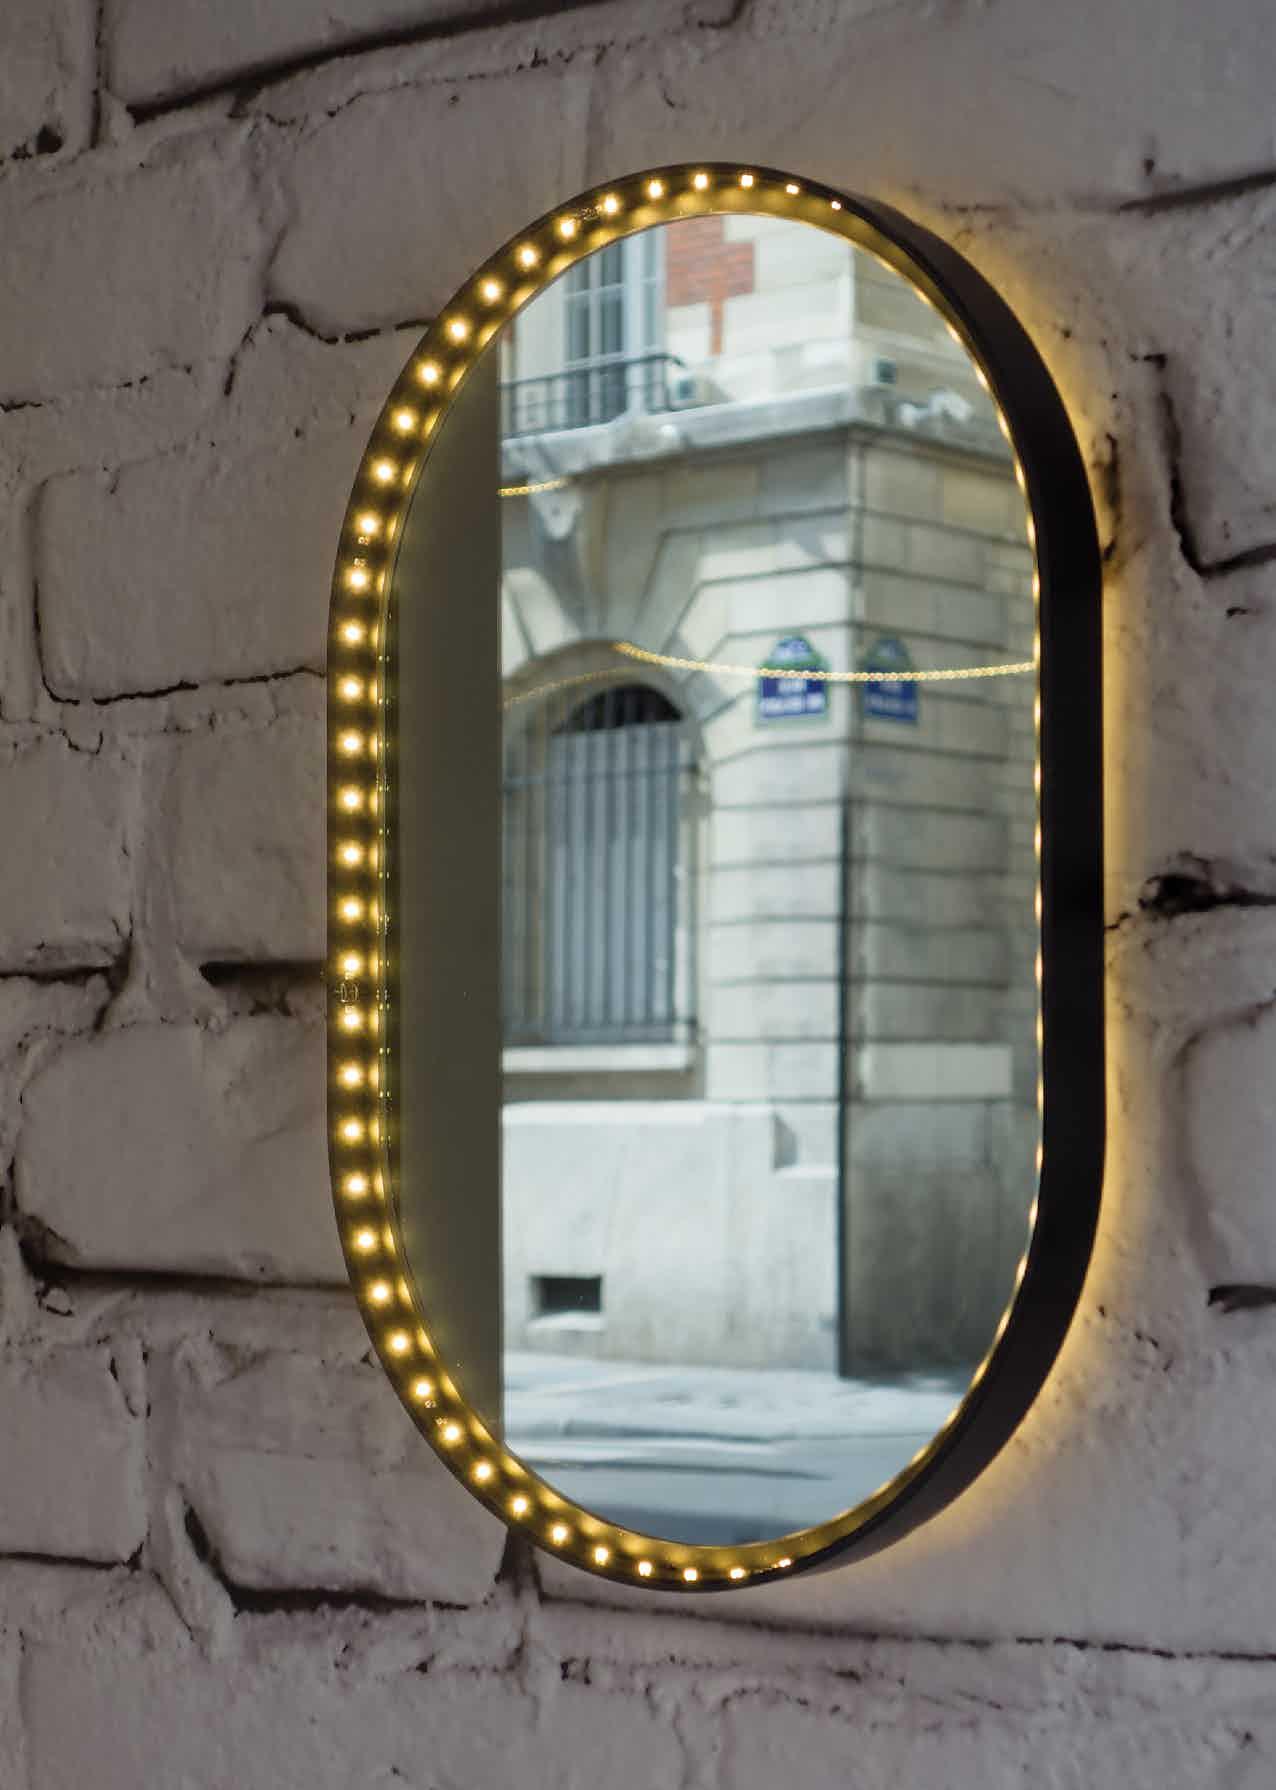 Le-deun-luminaires-vanity-oval-wall-mirror-34-haute-living